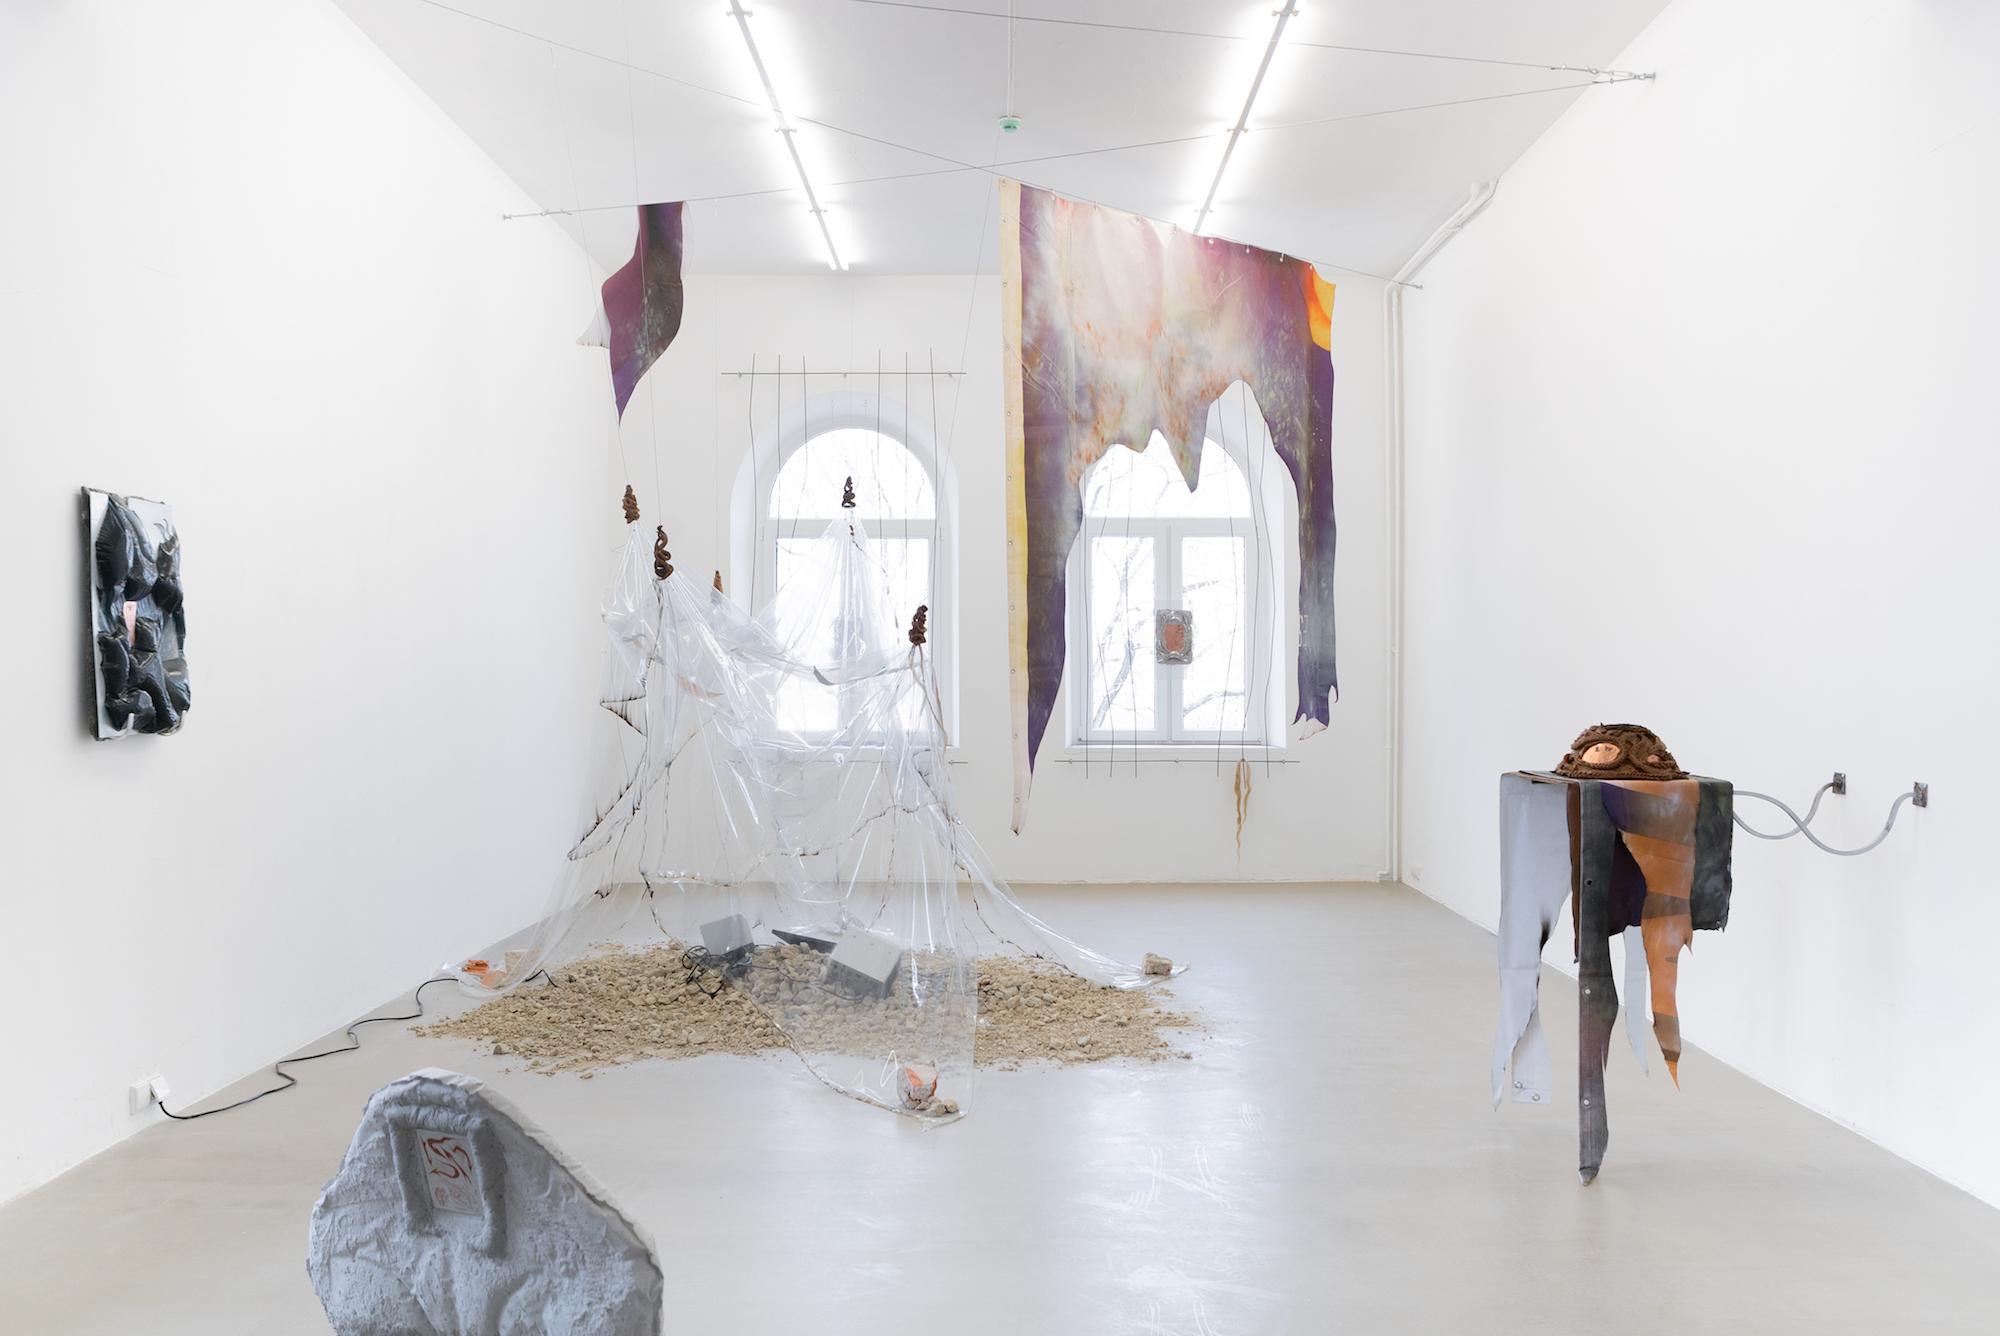 Exhibition 'Diluvial Valleys' at Swallow, curated by Vaida StepanovaitÄ—, 2021 Photographer: Laurynas Skeisgiela